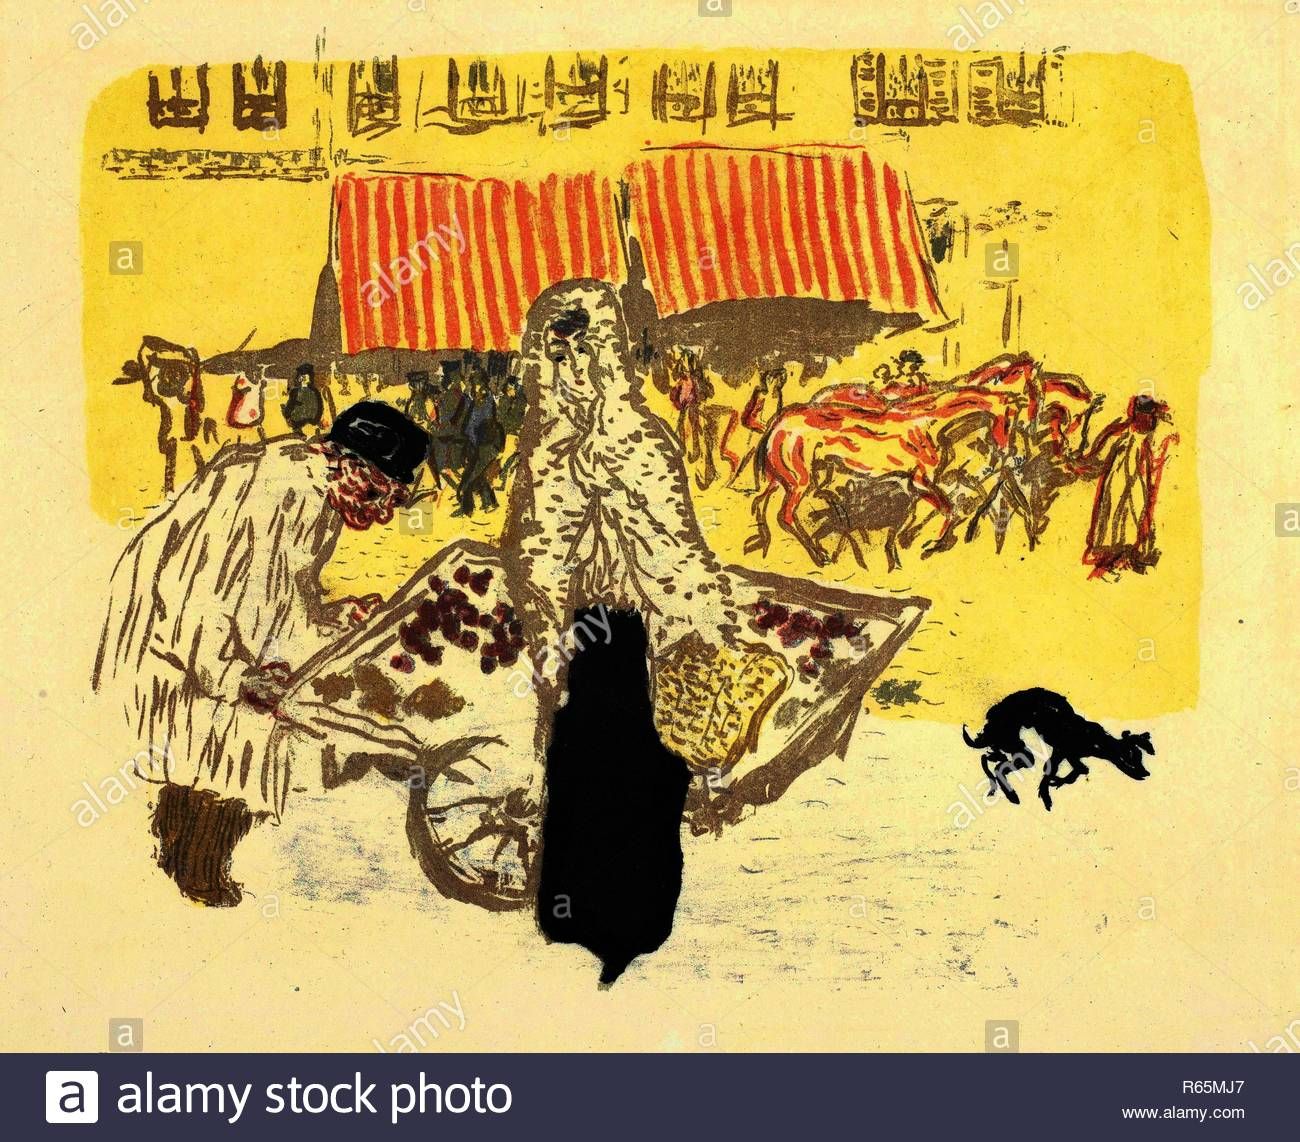 Ortolano (Le marchand des quatre-saisons). Dimensioni: 41 cm x 53 cm, 28 cm x 33,3 cm. Museo: Van Gogh Museum di Amsterdam. Autore: Bonnard Pierre. Immagini Stock